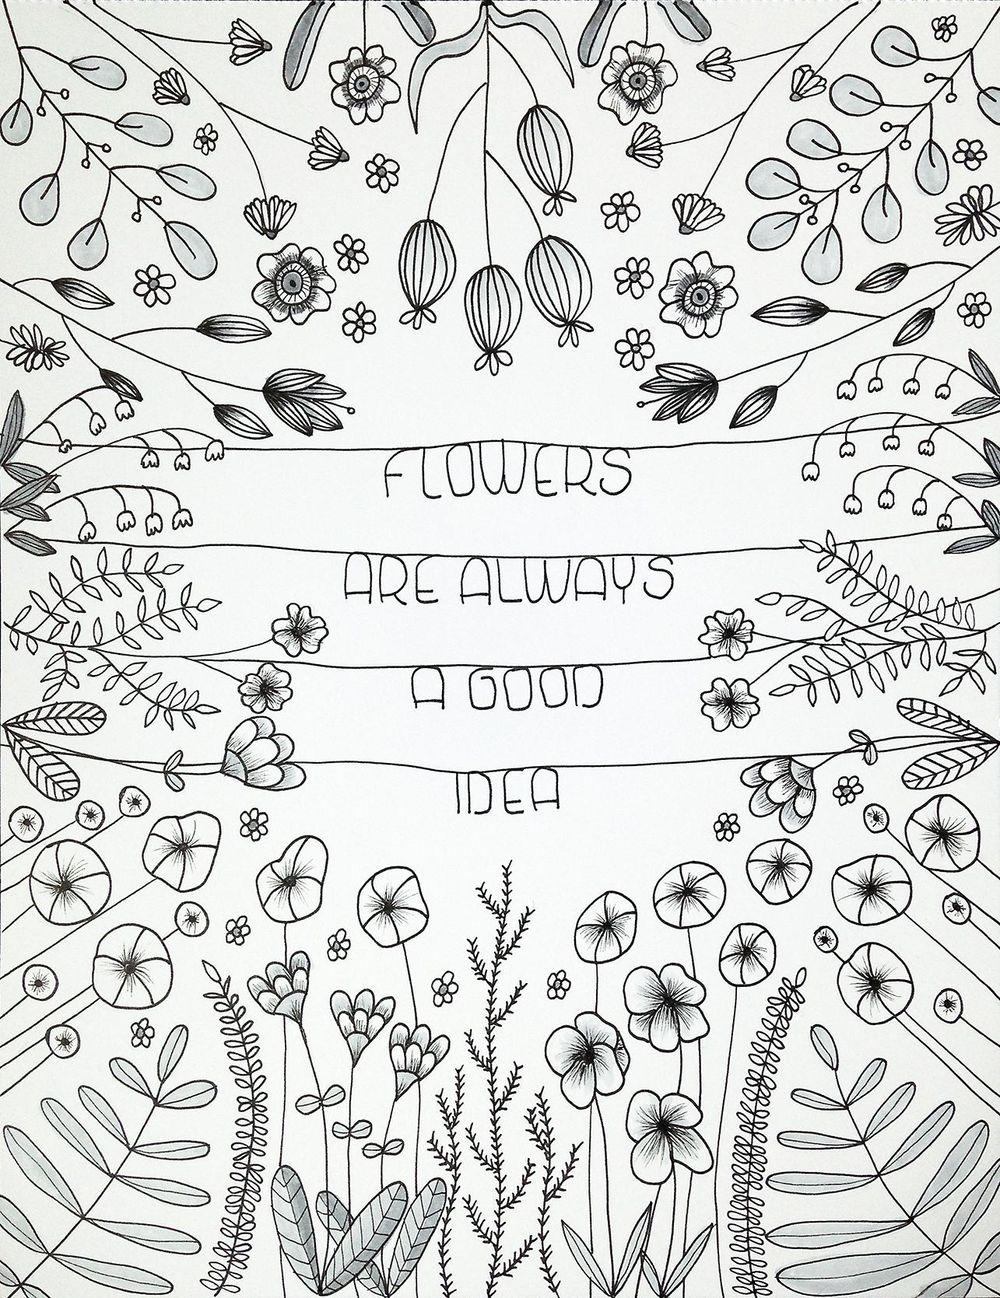 Bullet Journal Botanicals - image 11 - student project